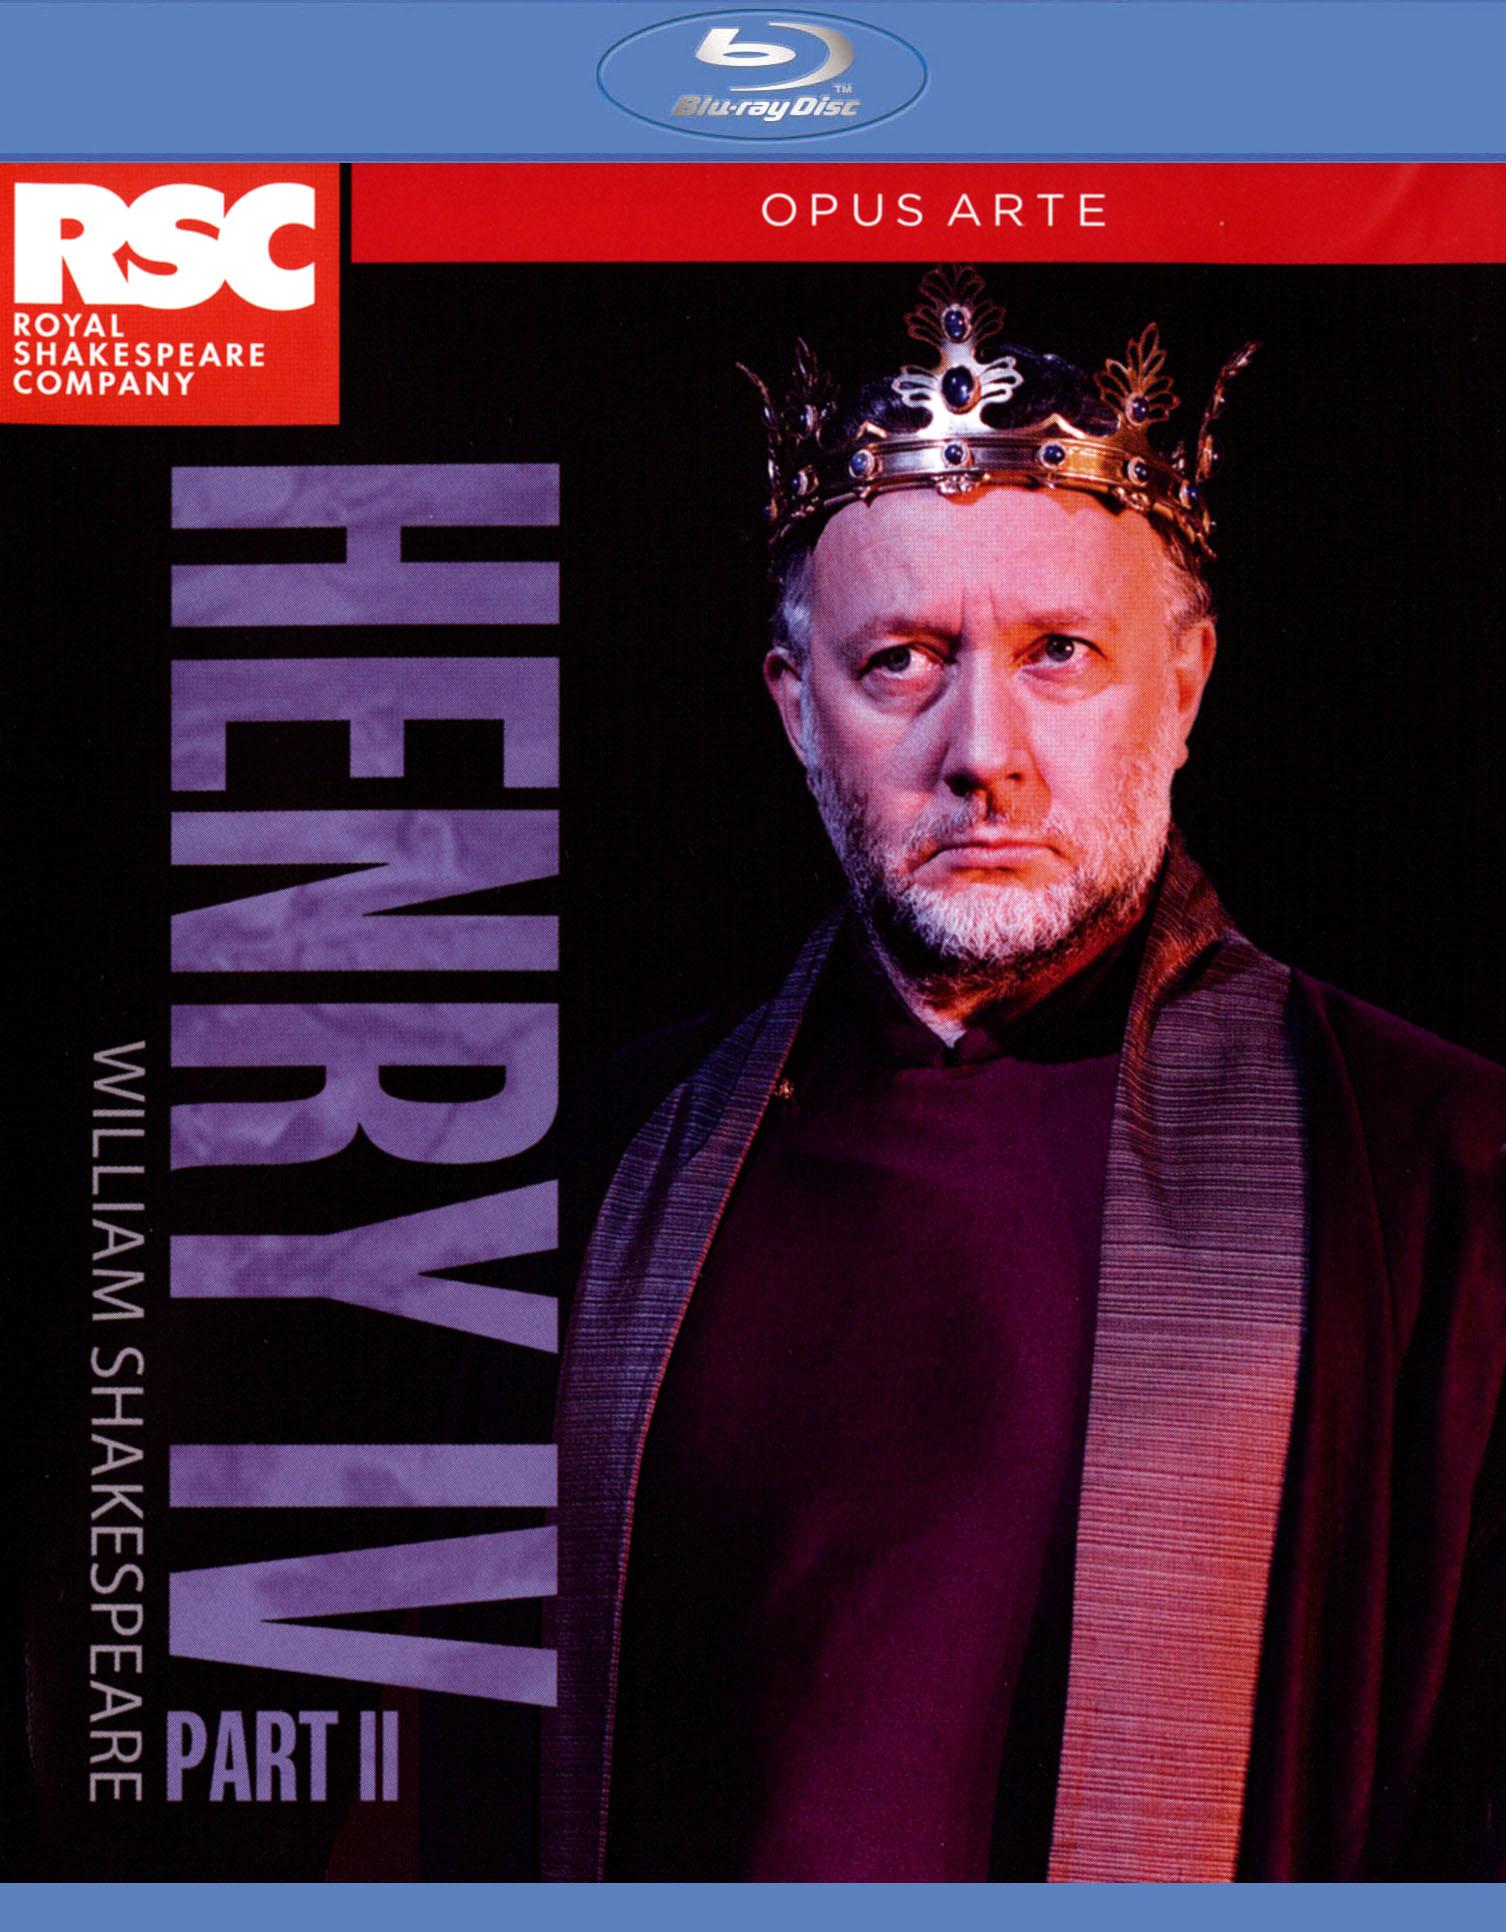 Royal Shakespeare Company: Henry IV, Part II